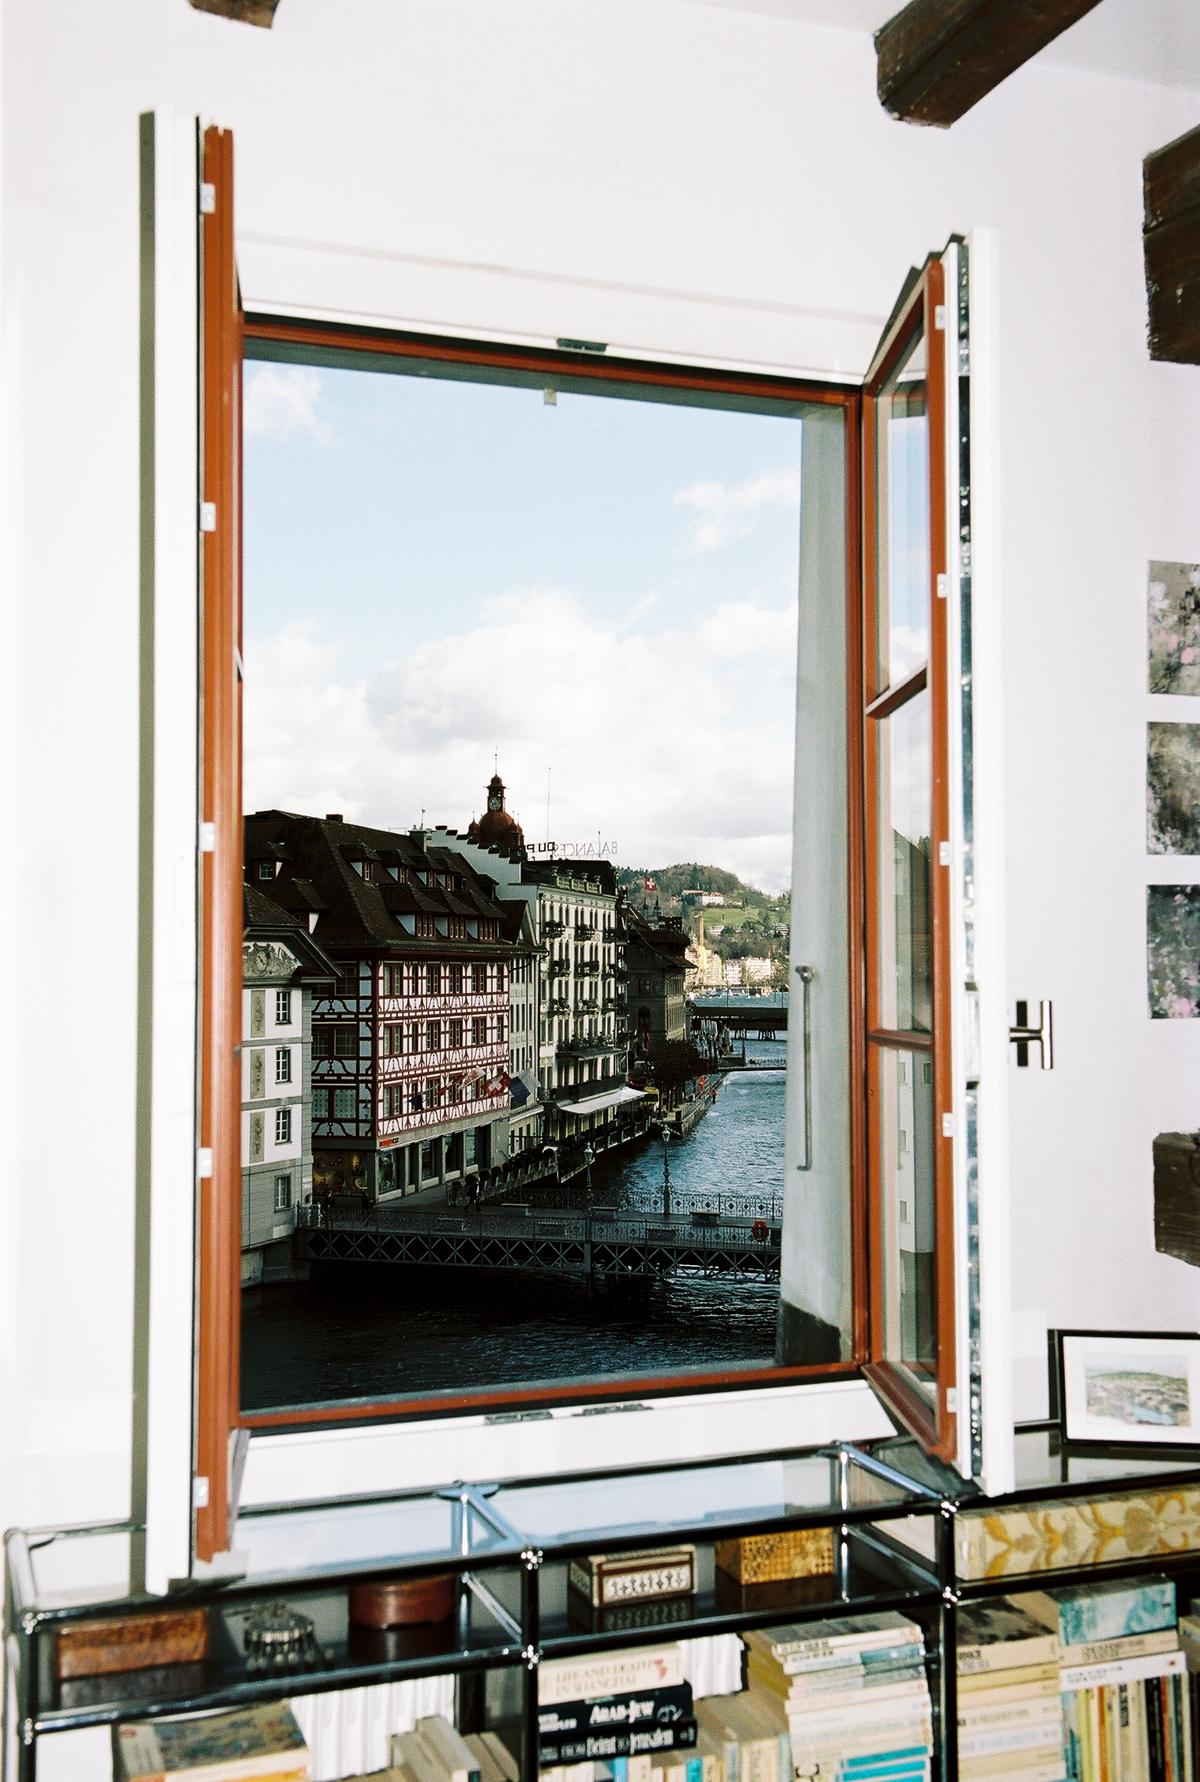 Simon Habegger Kathleen McNurney Luzern Altstadt Reuss